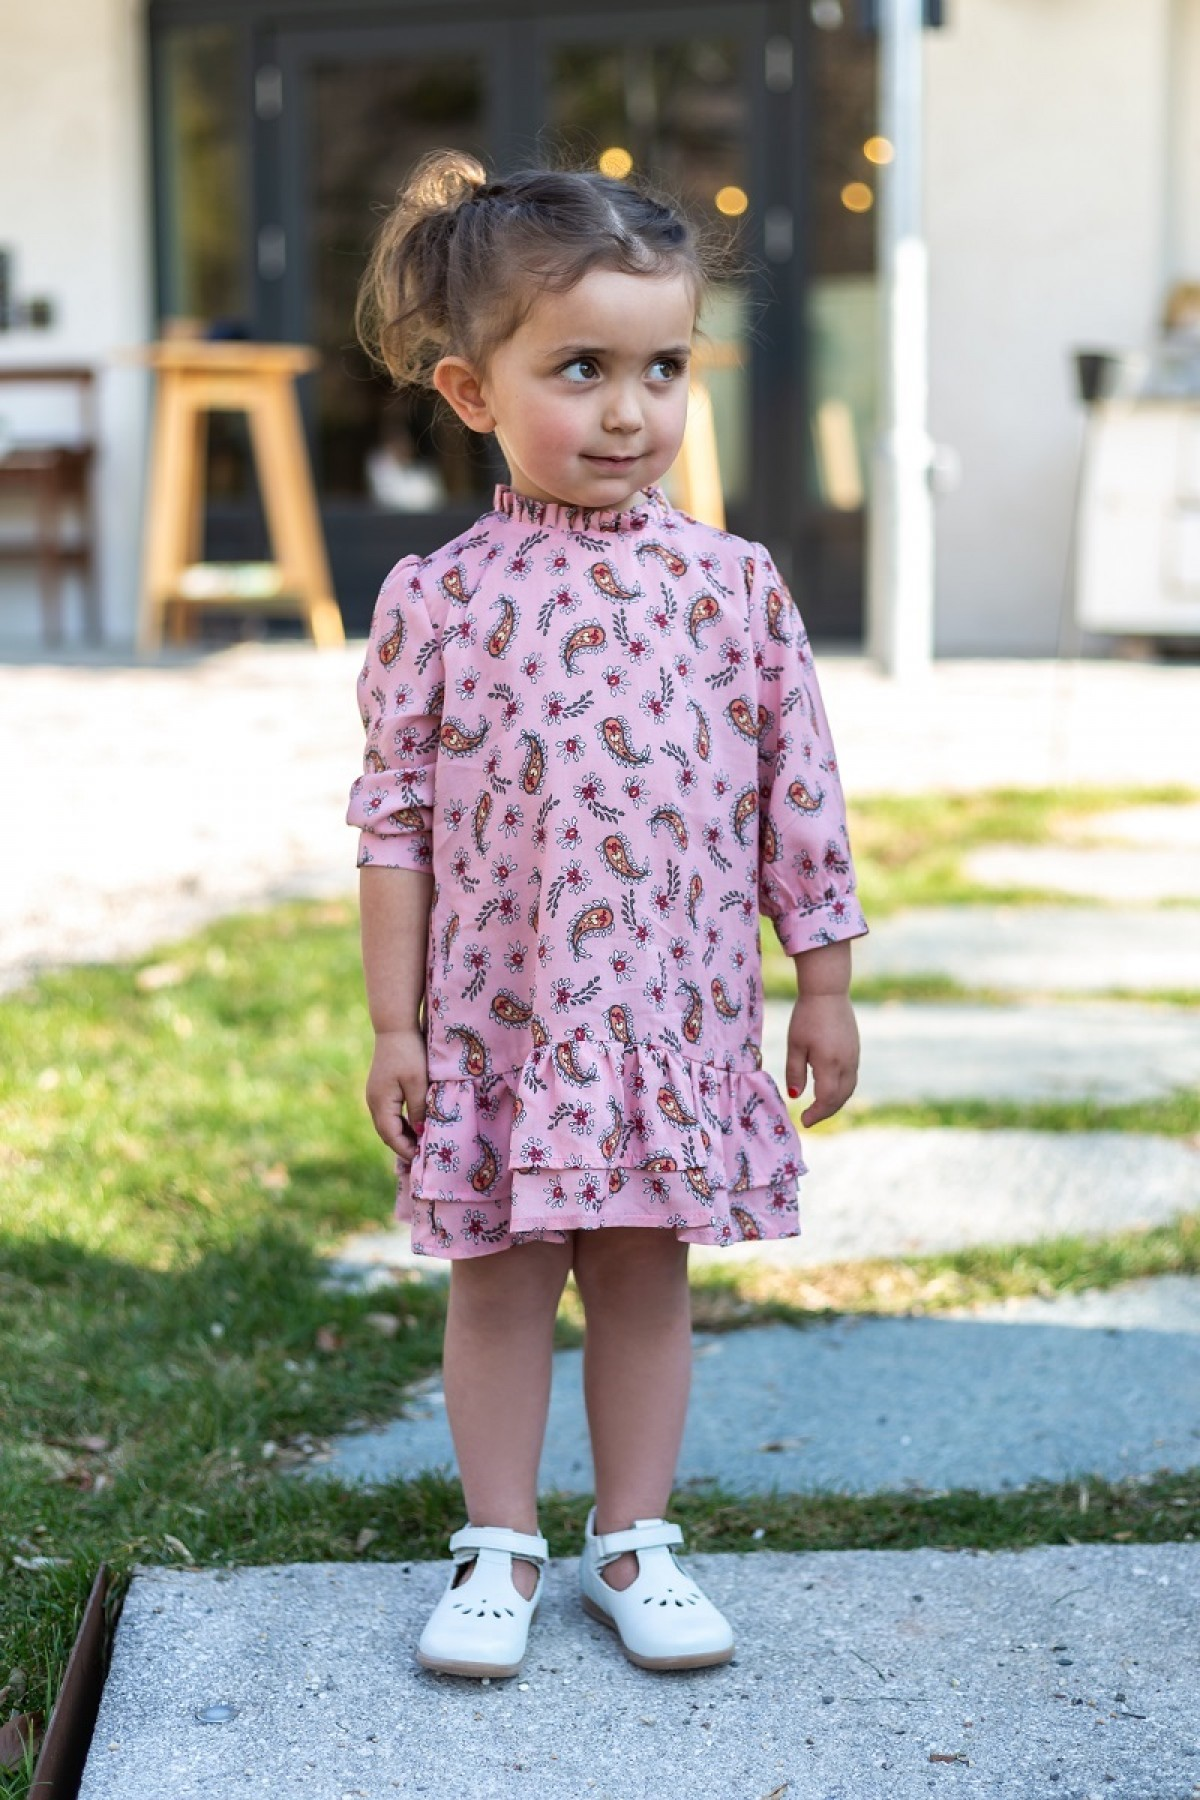 Mädchenkleid  piapaul. 811802 Viskosekleid mit Paisleymuster   Rosé